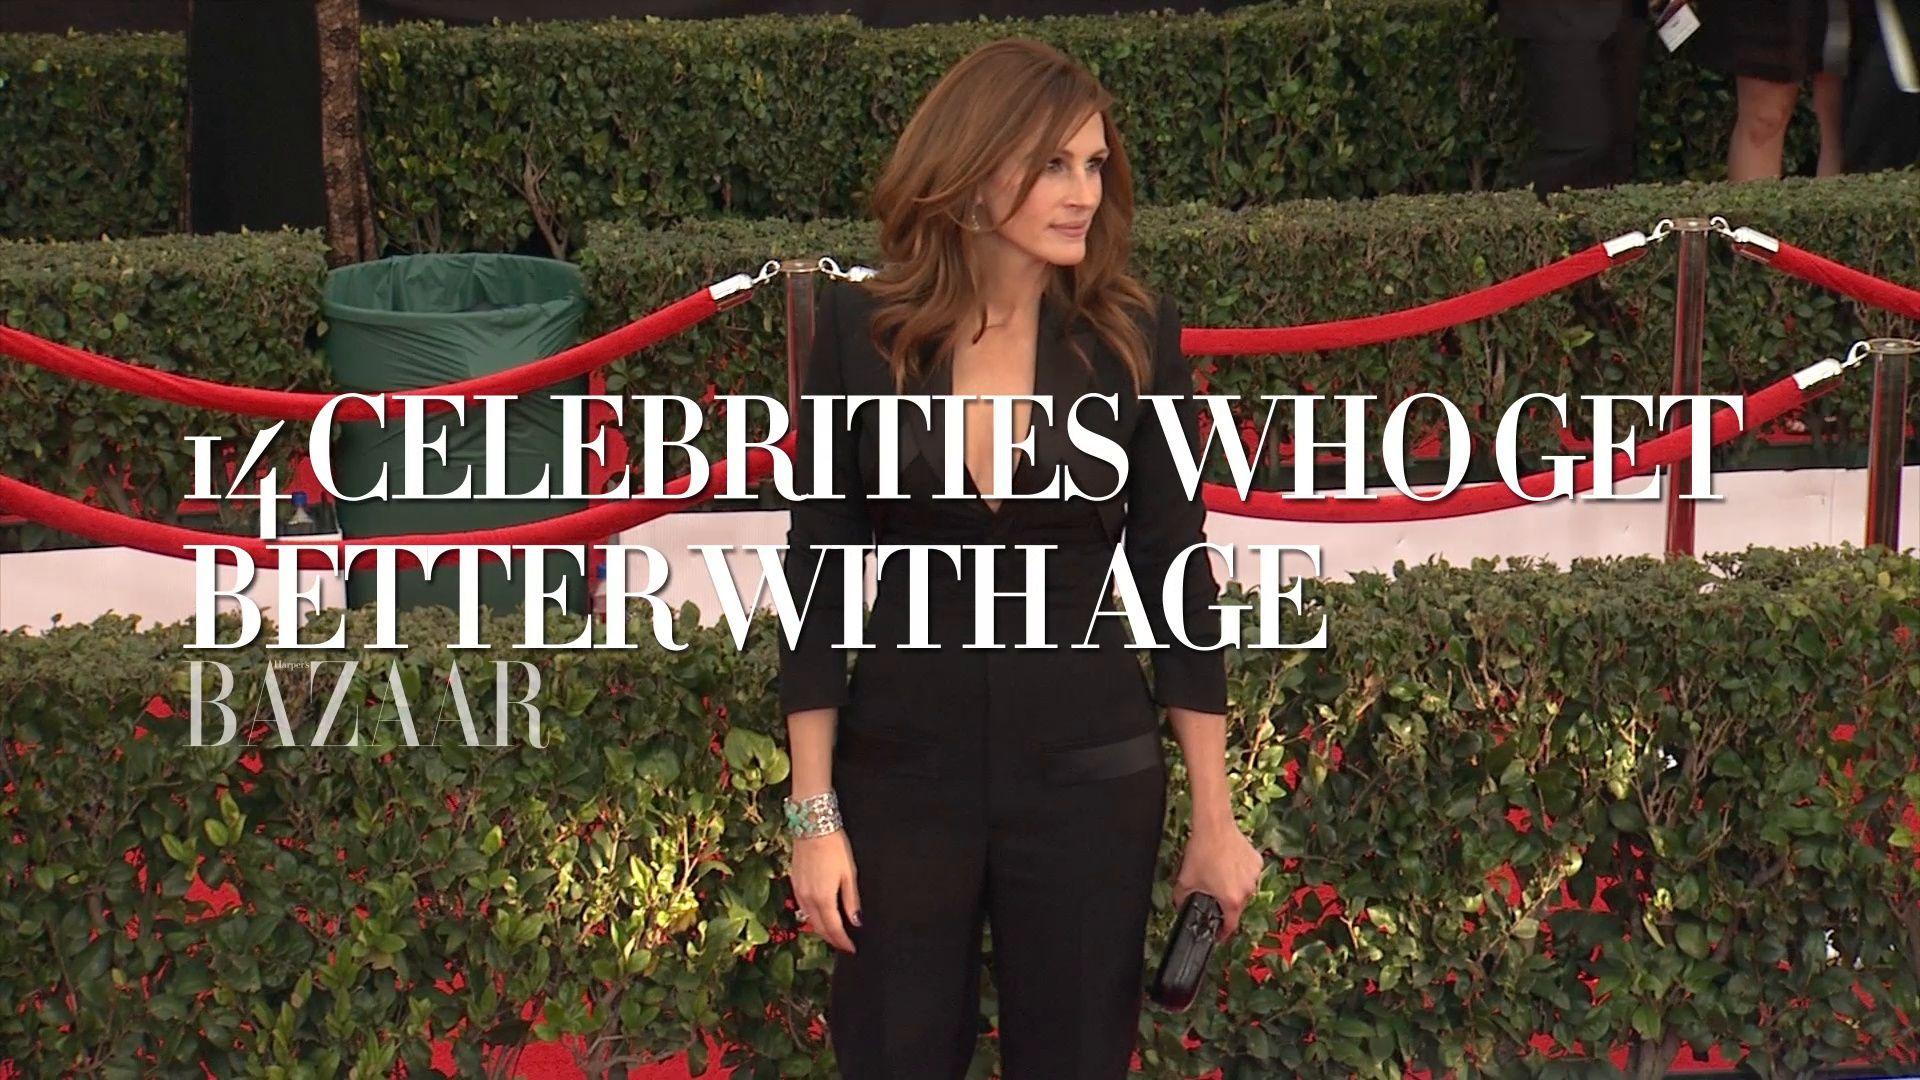 Celebrity fat shaming has ripple effects on women's ...